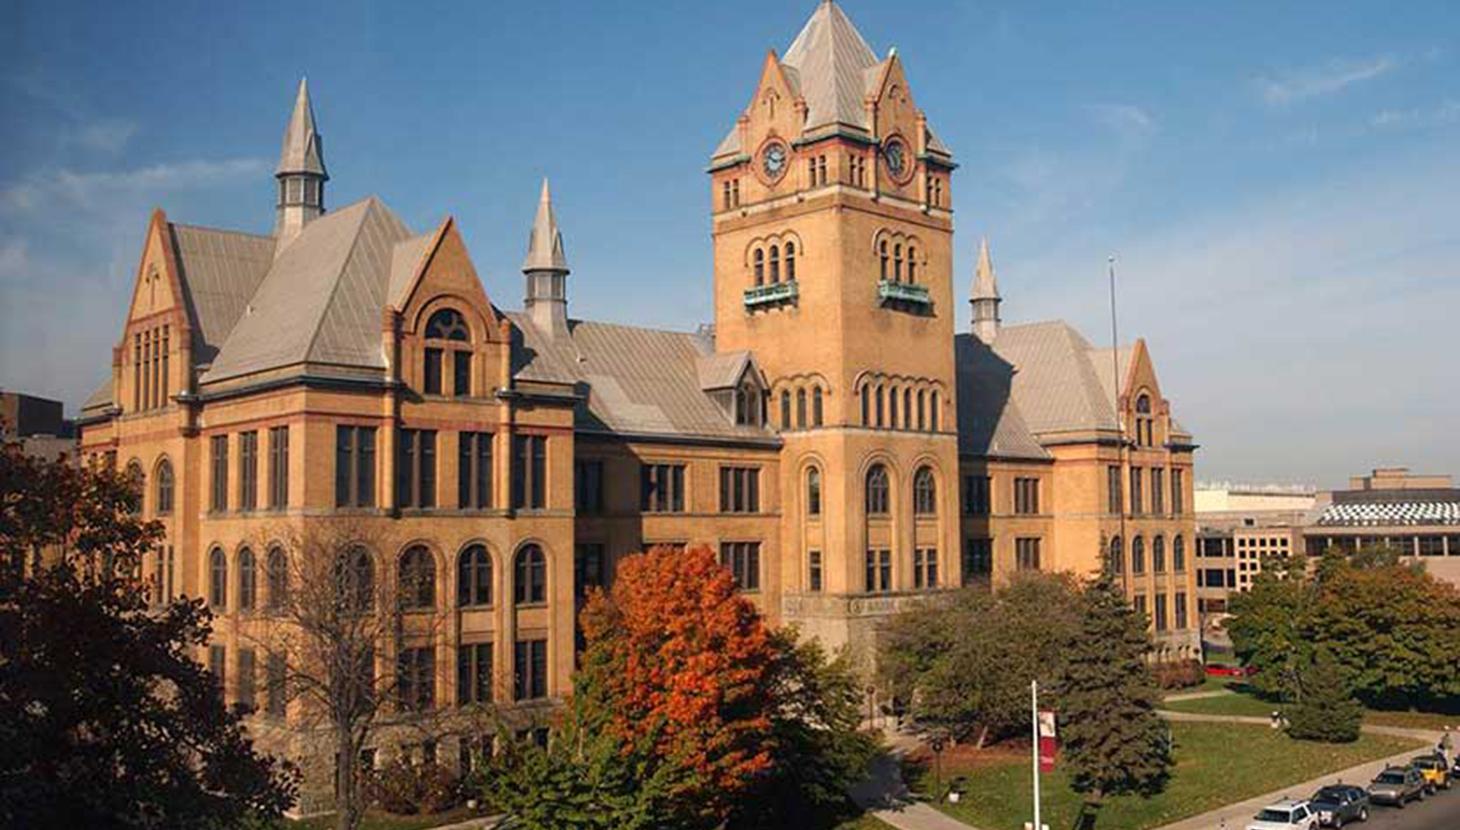 WSU's august 'Old Main' Building. ph. University Research Corridor